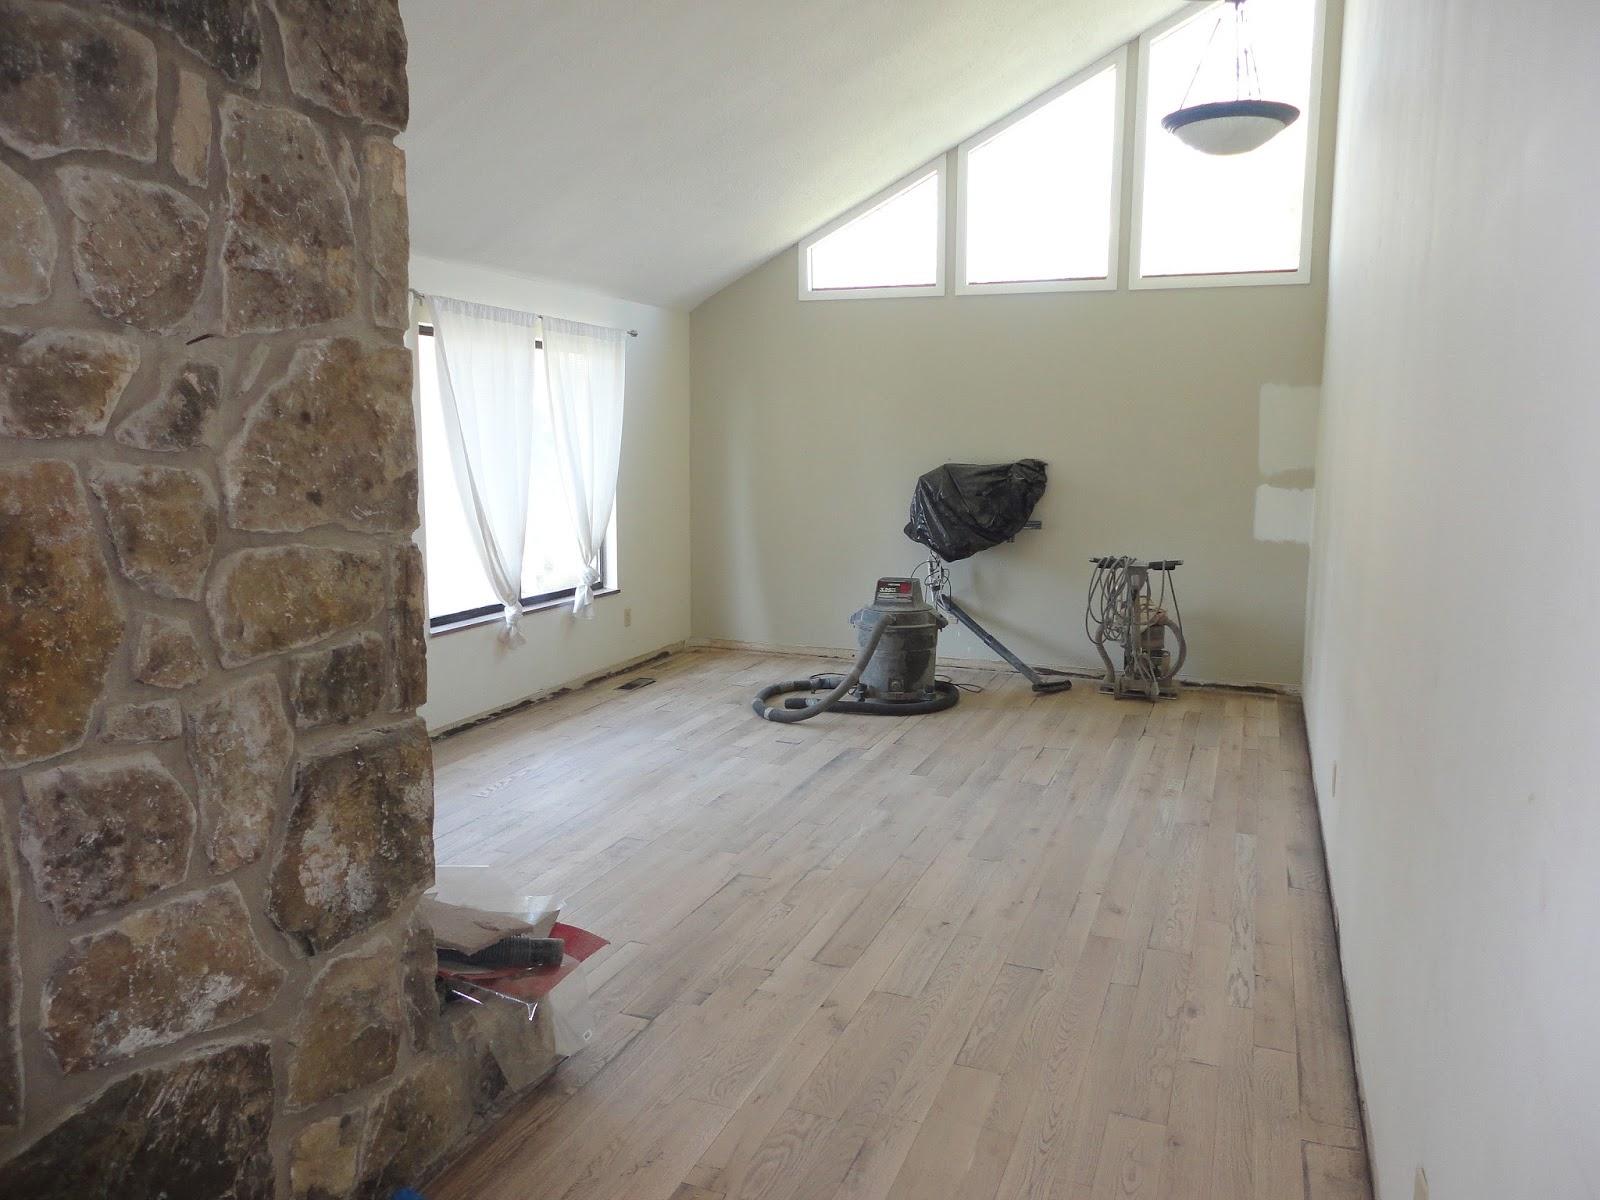 hardwood s our part livelovediy my makeover house blonde biggest flooring it floors